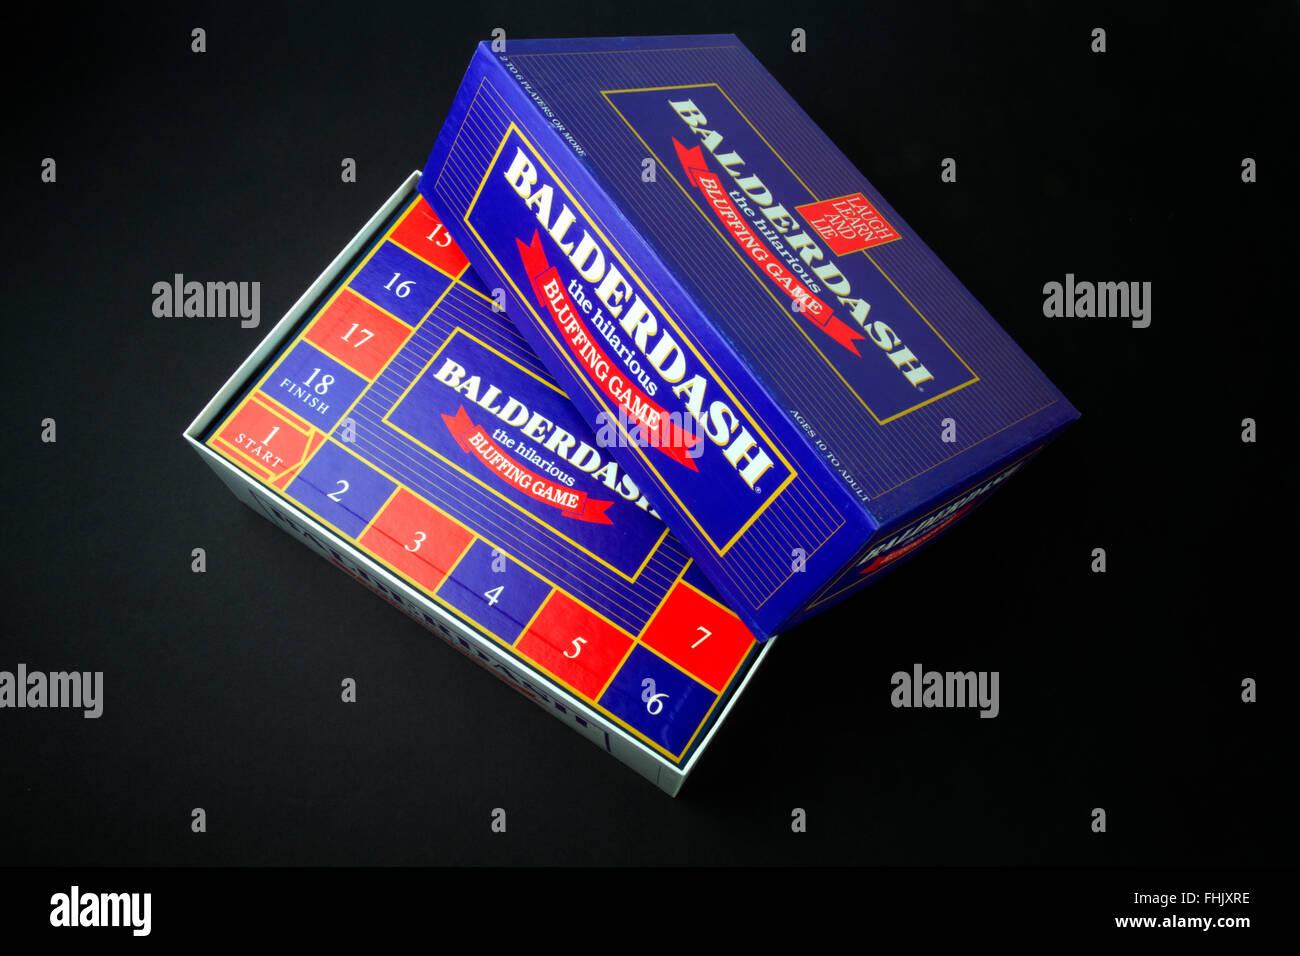 Balderdash bluffing board game on a black background Stock Photo